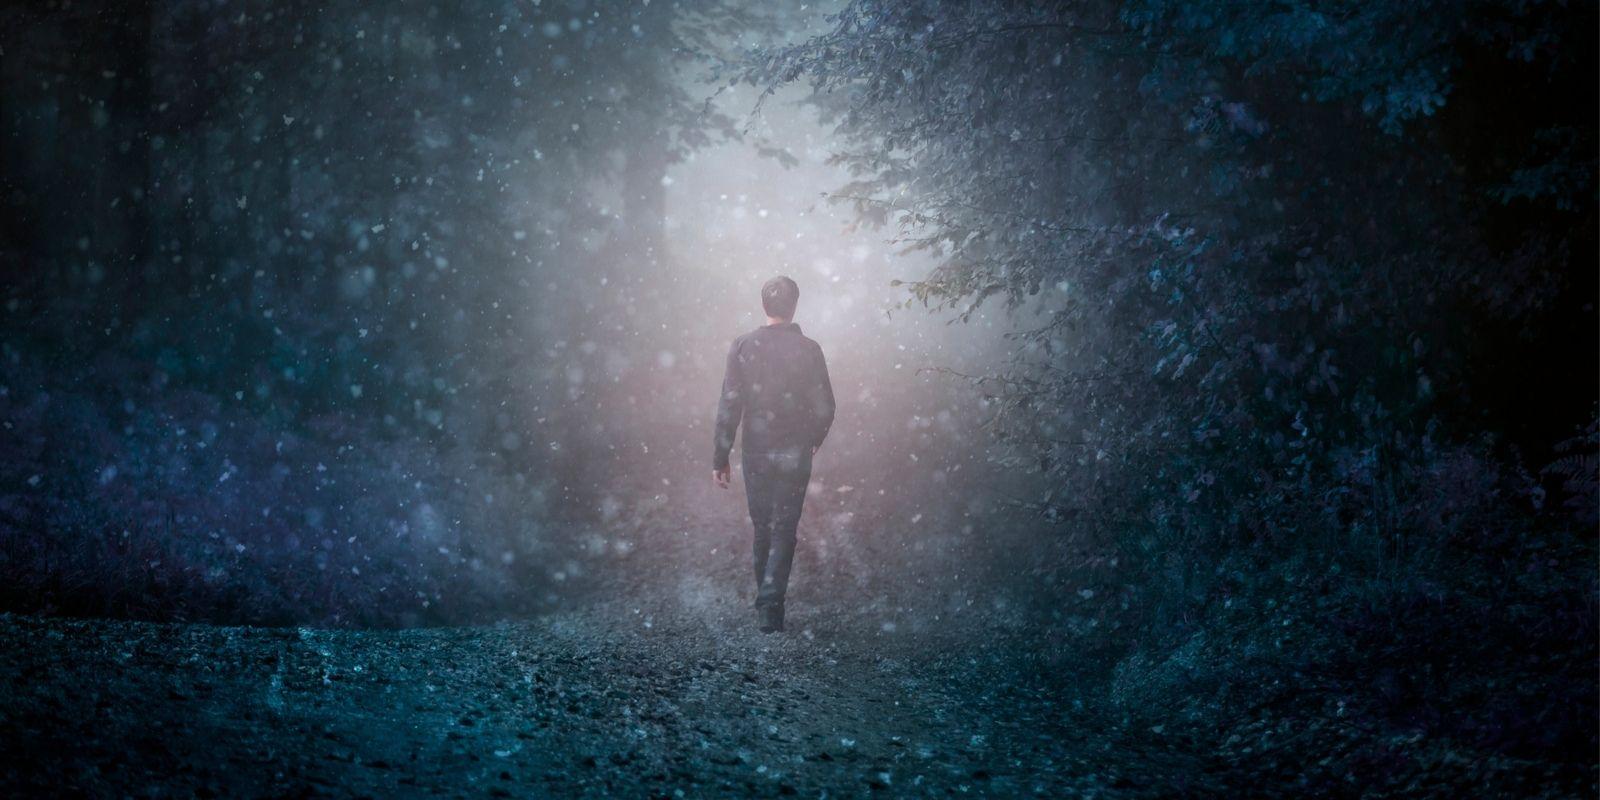 transpersonal paths spiritual meditation prayer